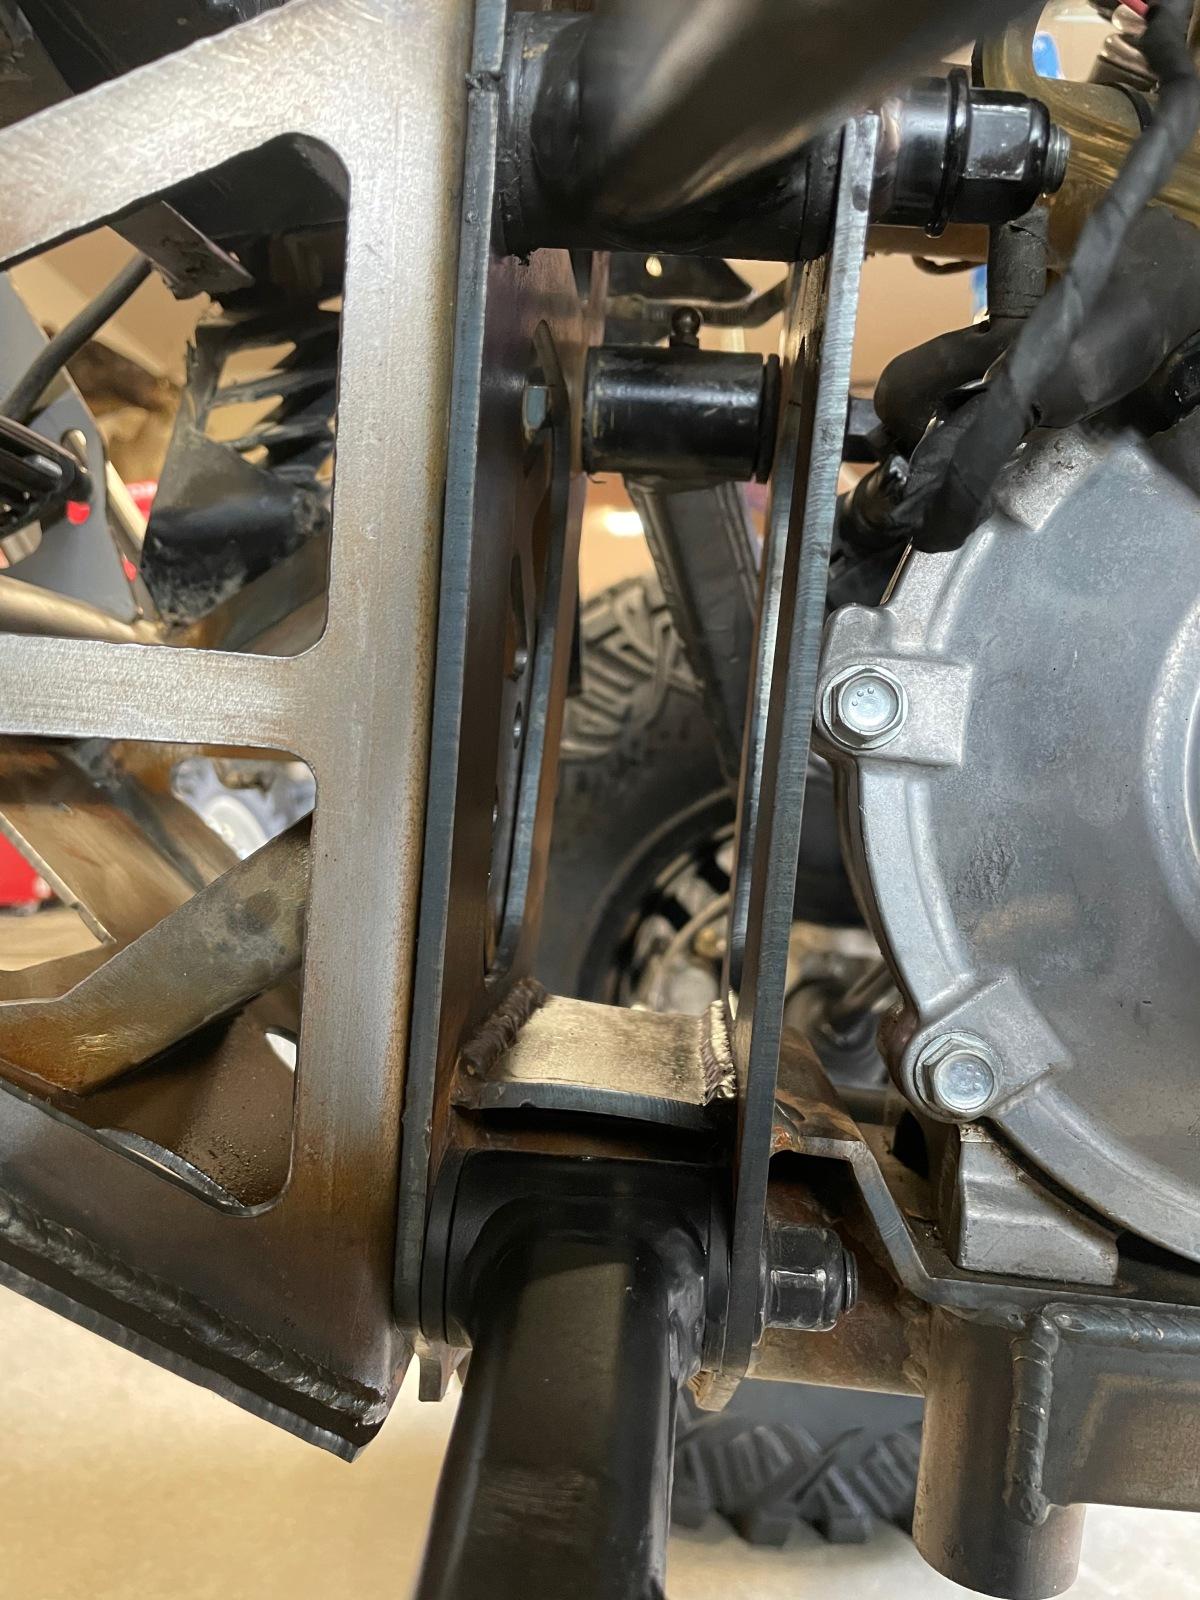 For Sale: 2018 can am maverick x3 Rs turbo race ready - photo1